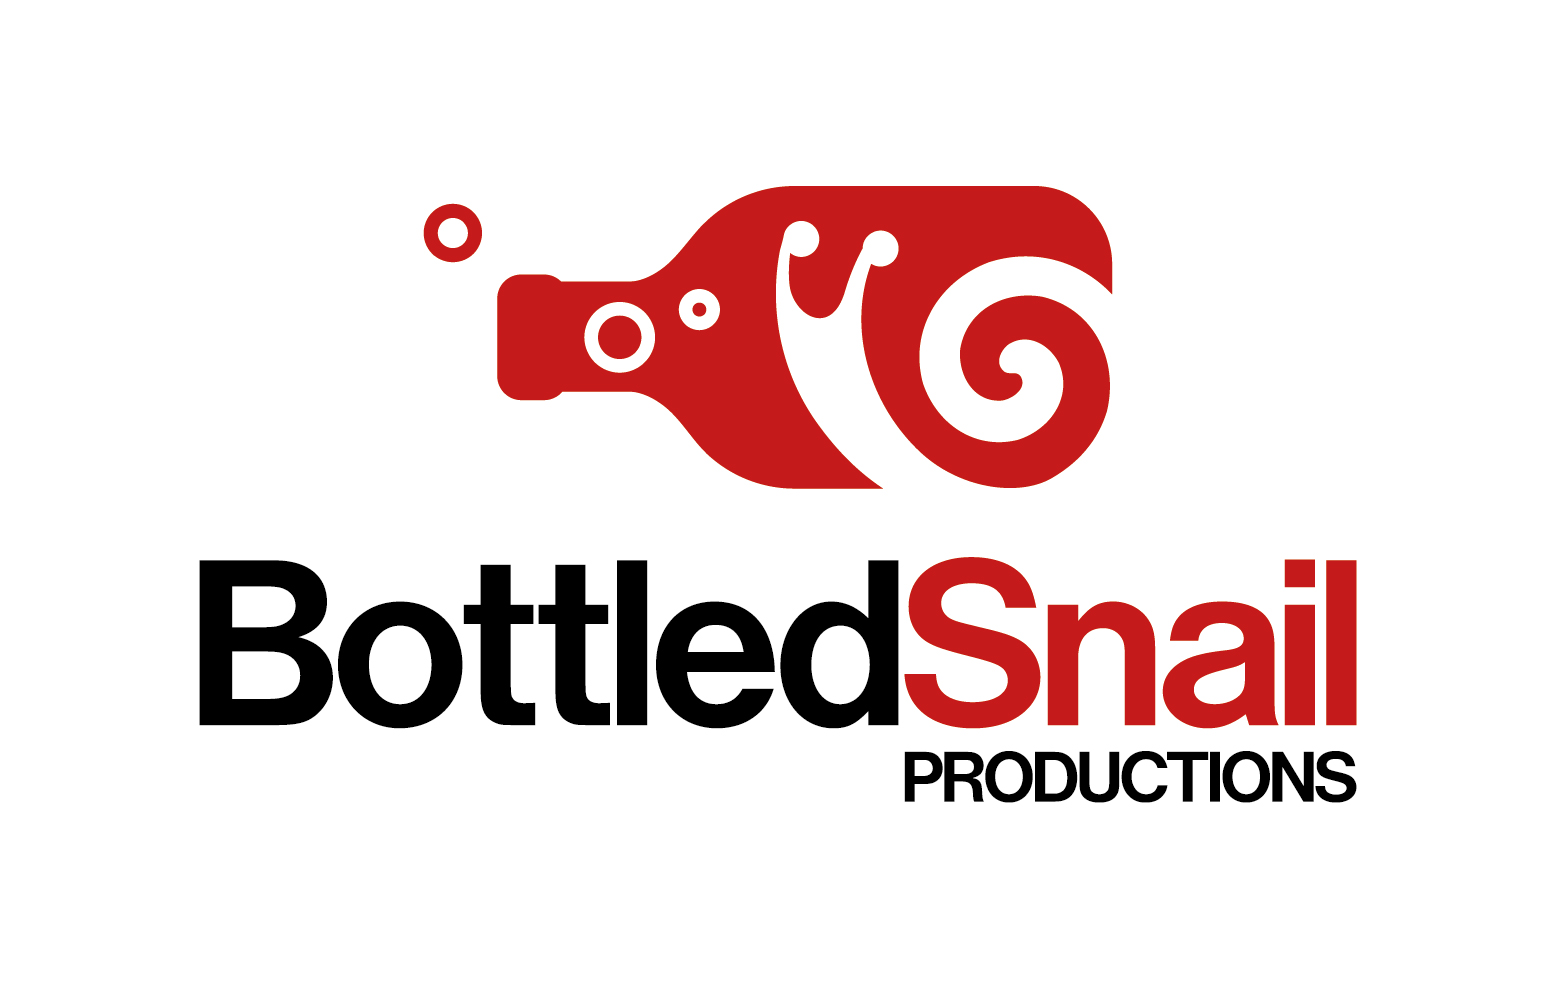 BottledSnail Productions